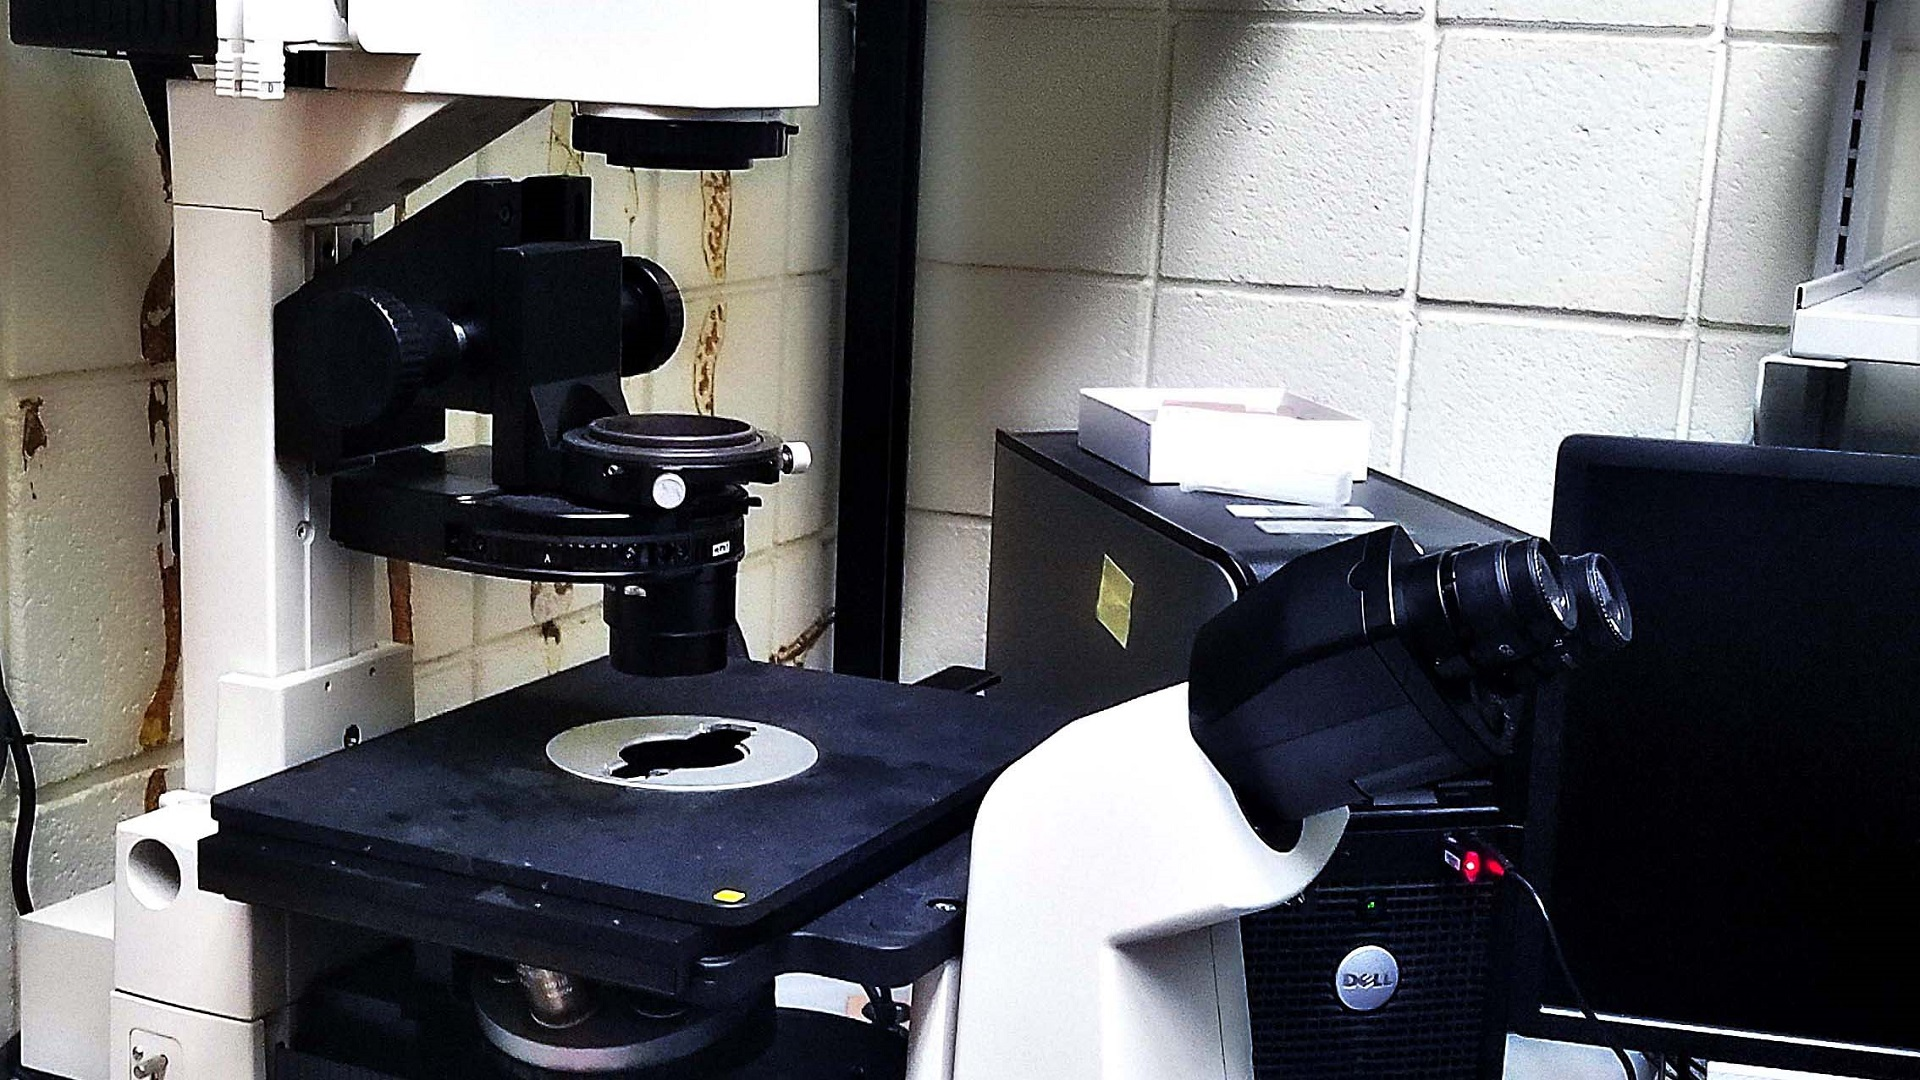 Other microscope 1920x1080-11mog40